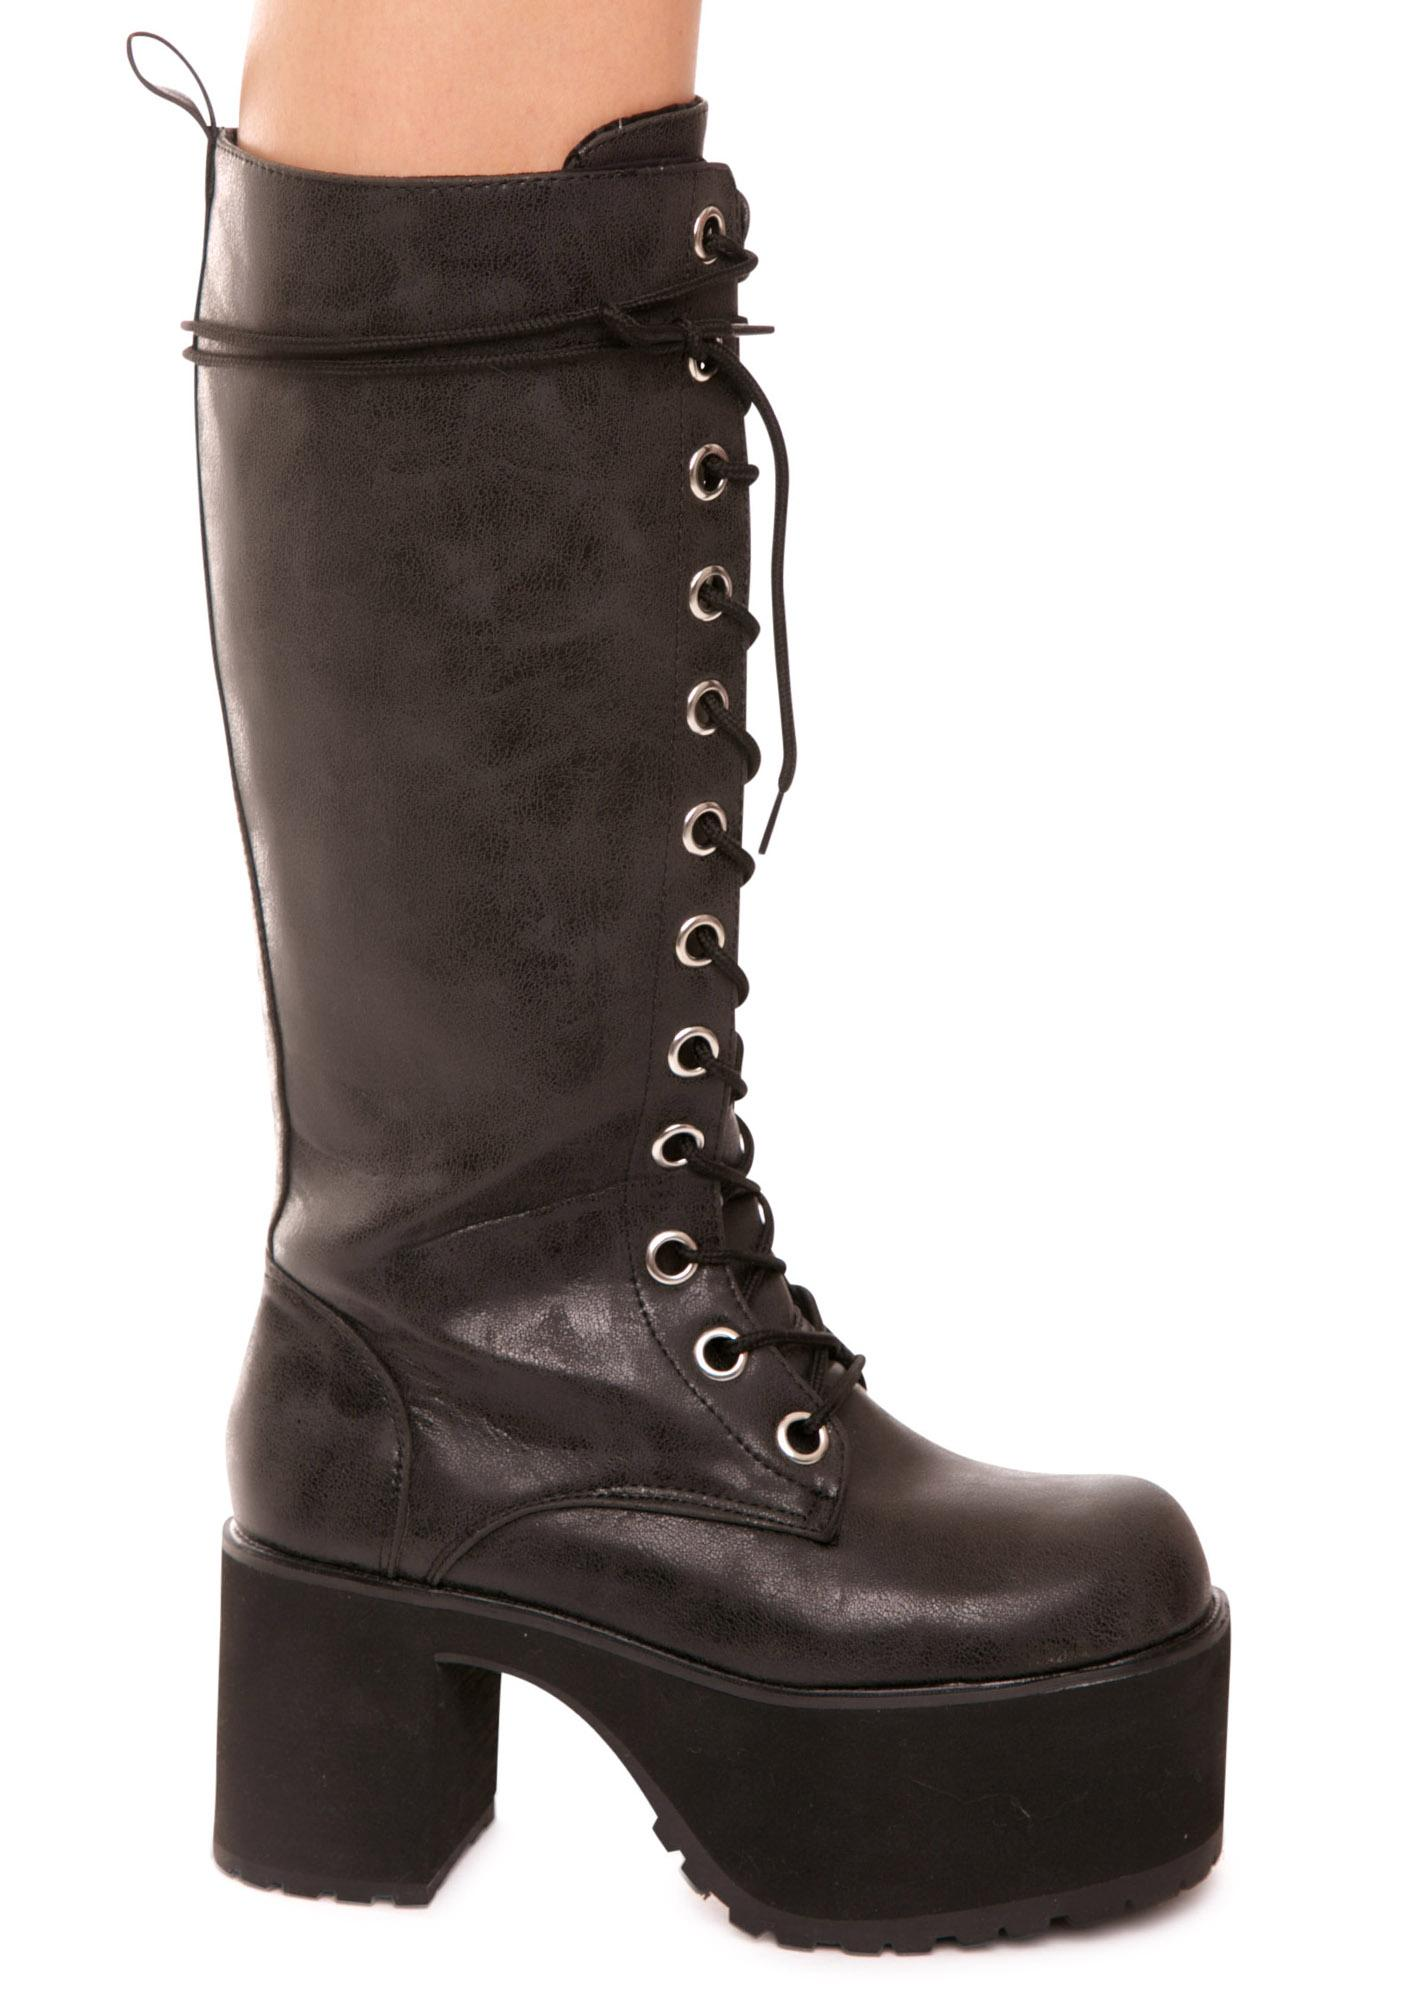 T.U.K. 12-Eye Nosebleed Platform Boots